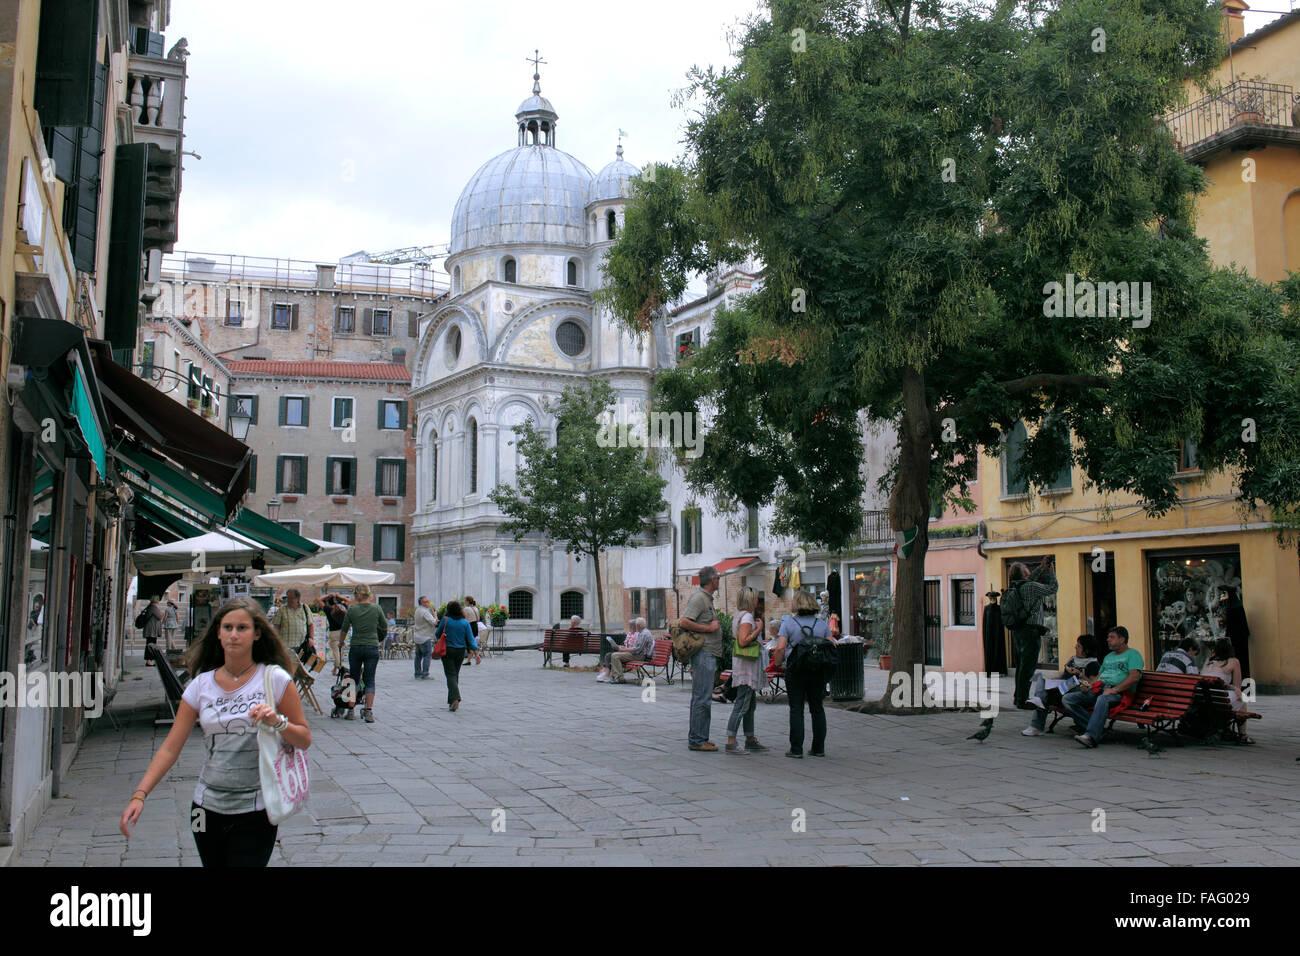 Campo Santa Maria Nova, a small square in Venice next to the fifteenth century church of Santa Maria dei Miracoli. - Stock Image